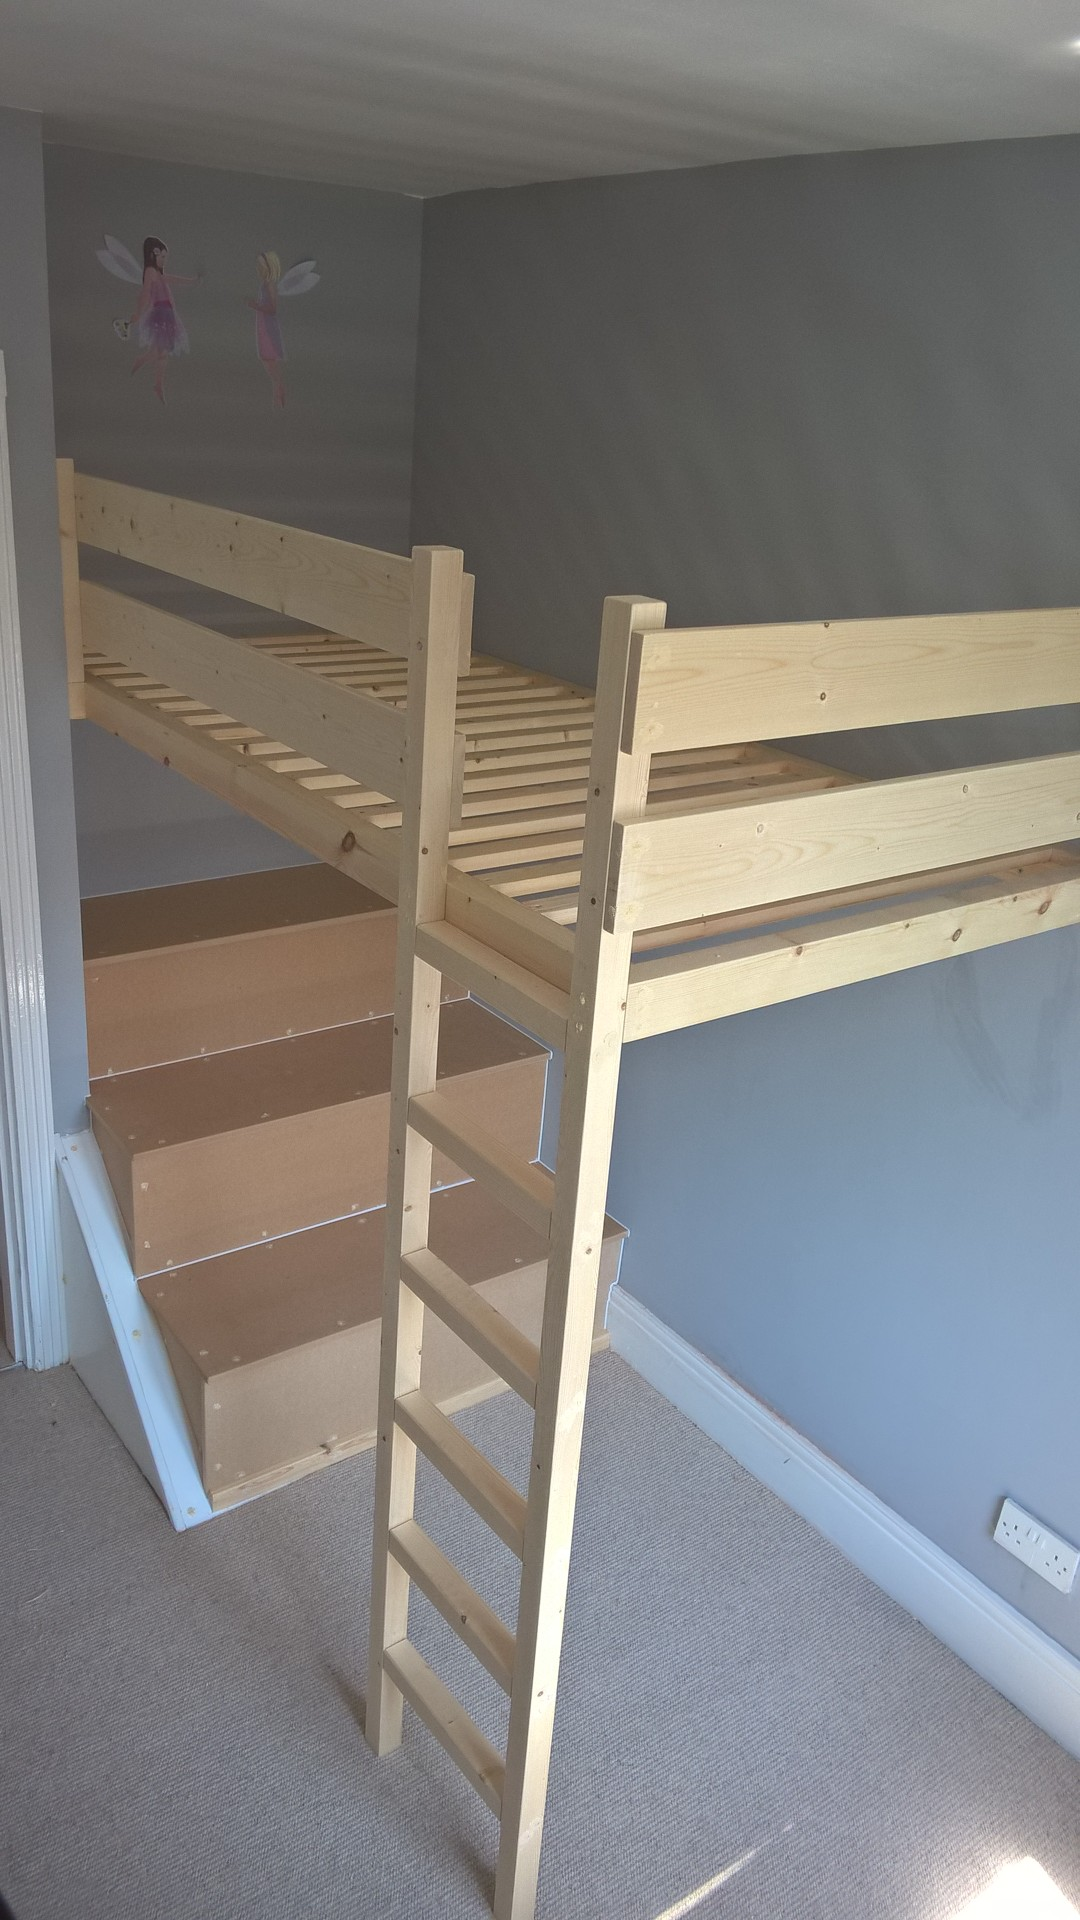 Small Box Room Cabin Bed For Grandma: Stephen Francis